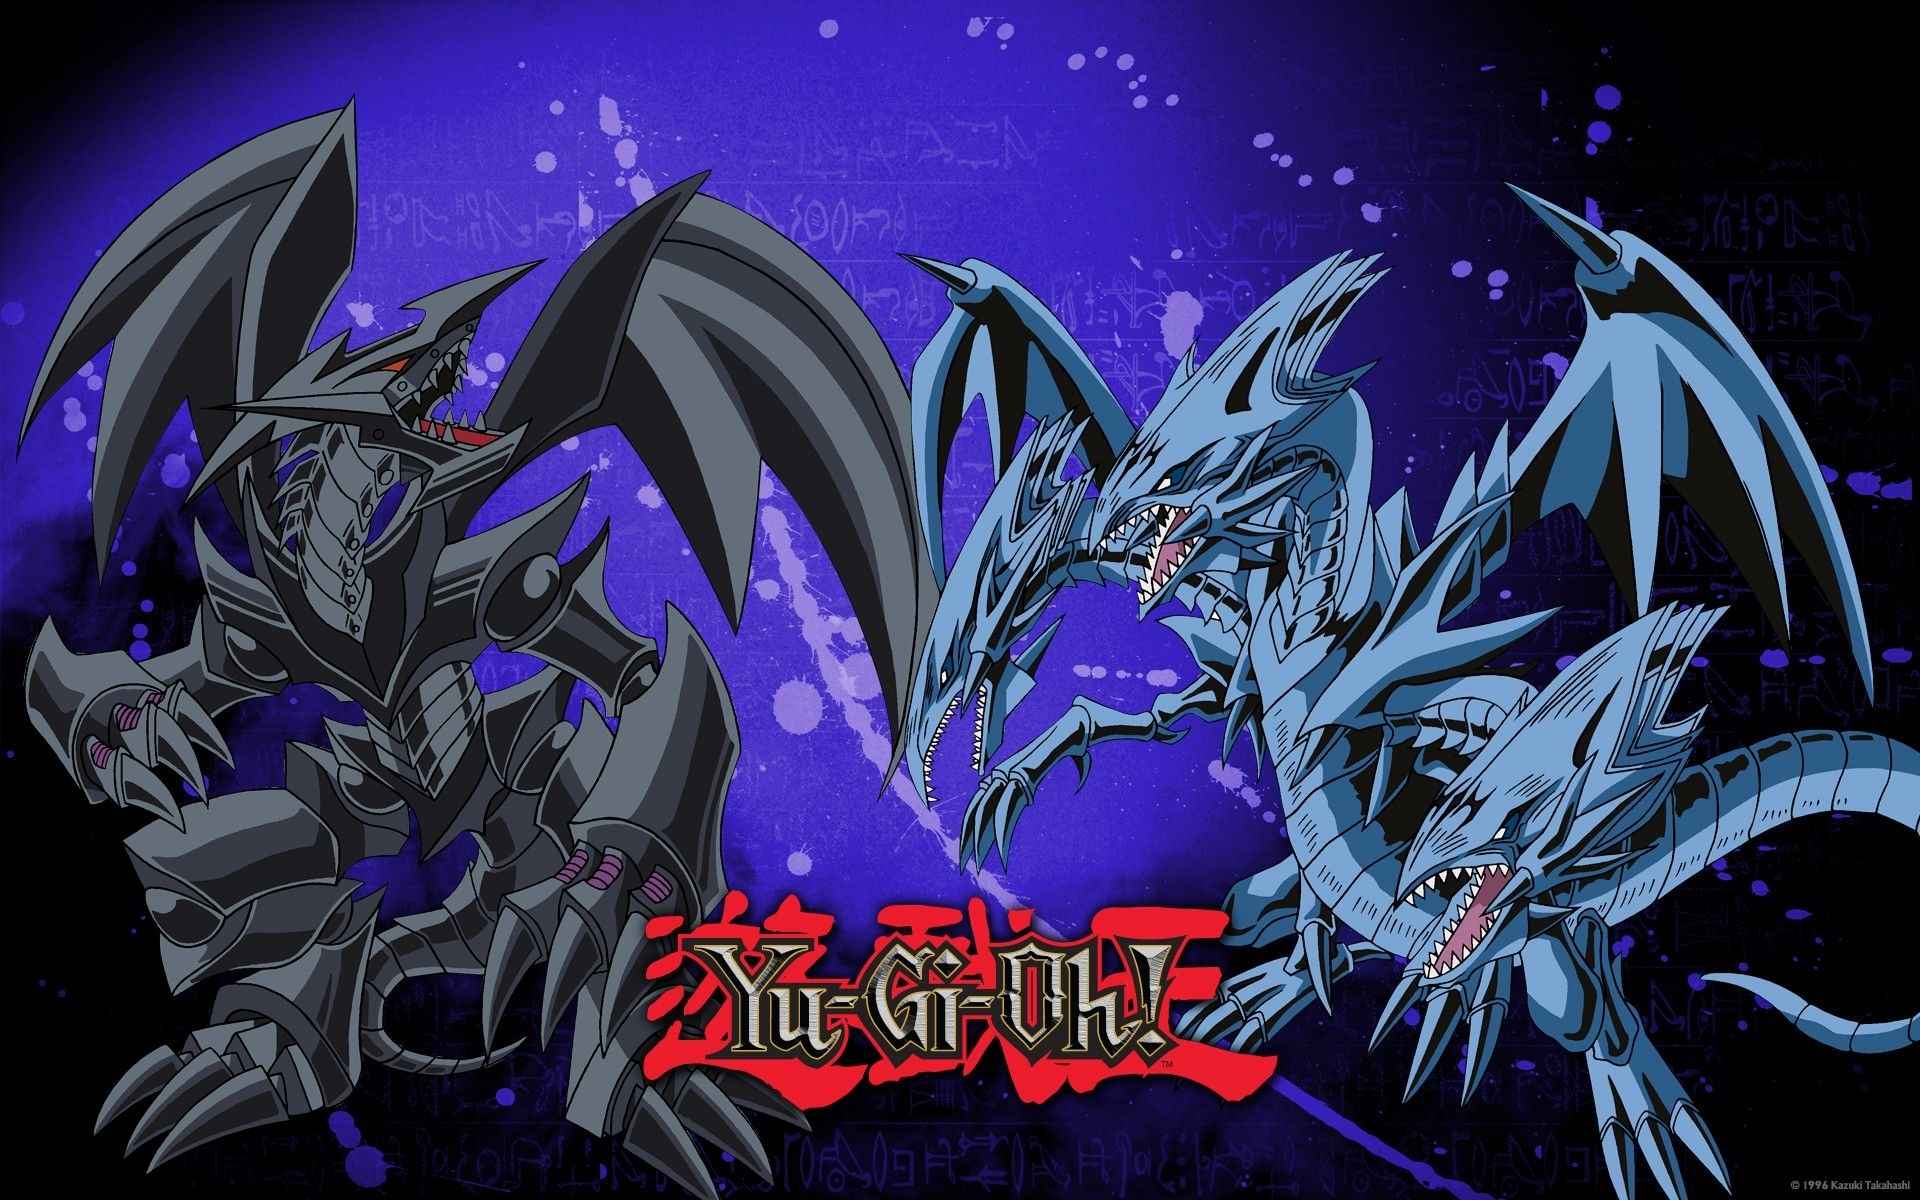 yu gi oh images red eyes black dragon vs blue eyes white dragon hd